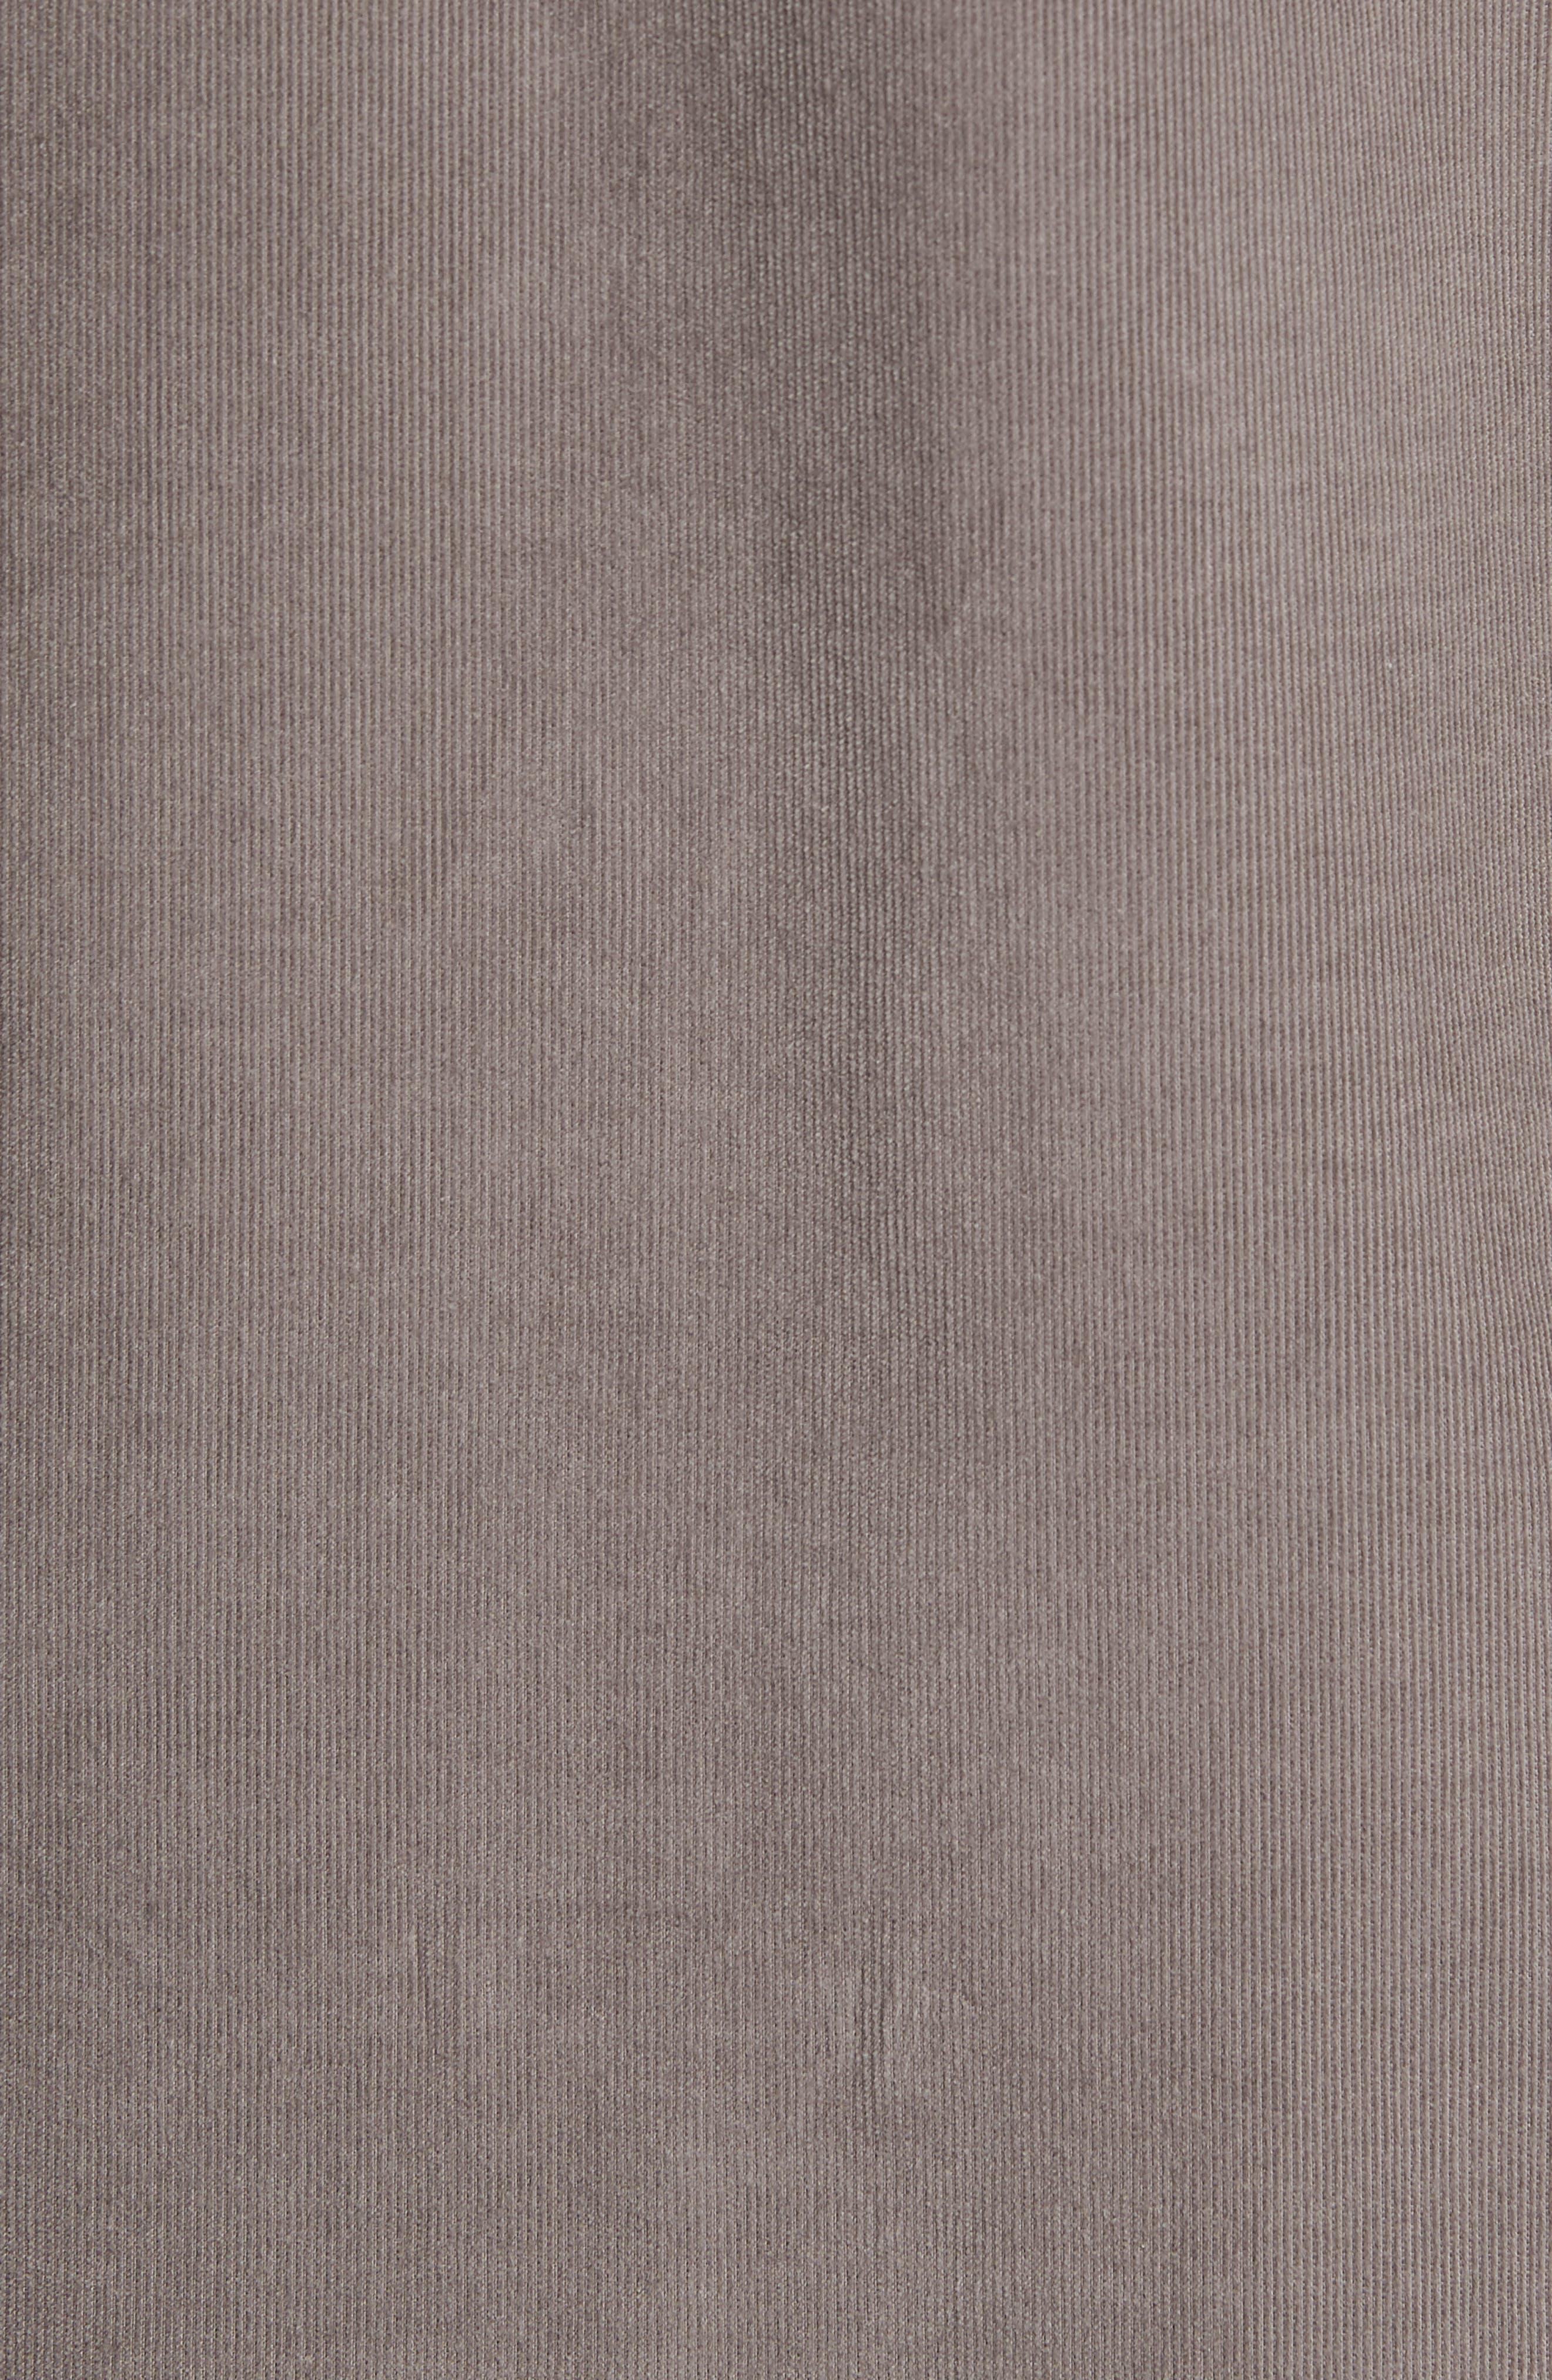 Harrison Cord Standard Fit Shirt,                             Alternate thumbnail 5, color,                             Pebble Grey